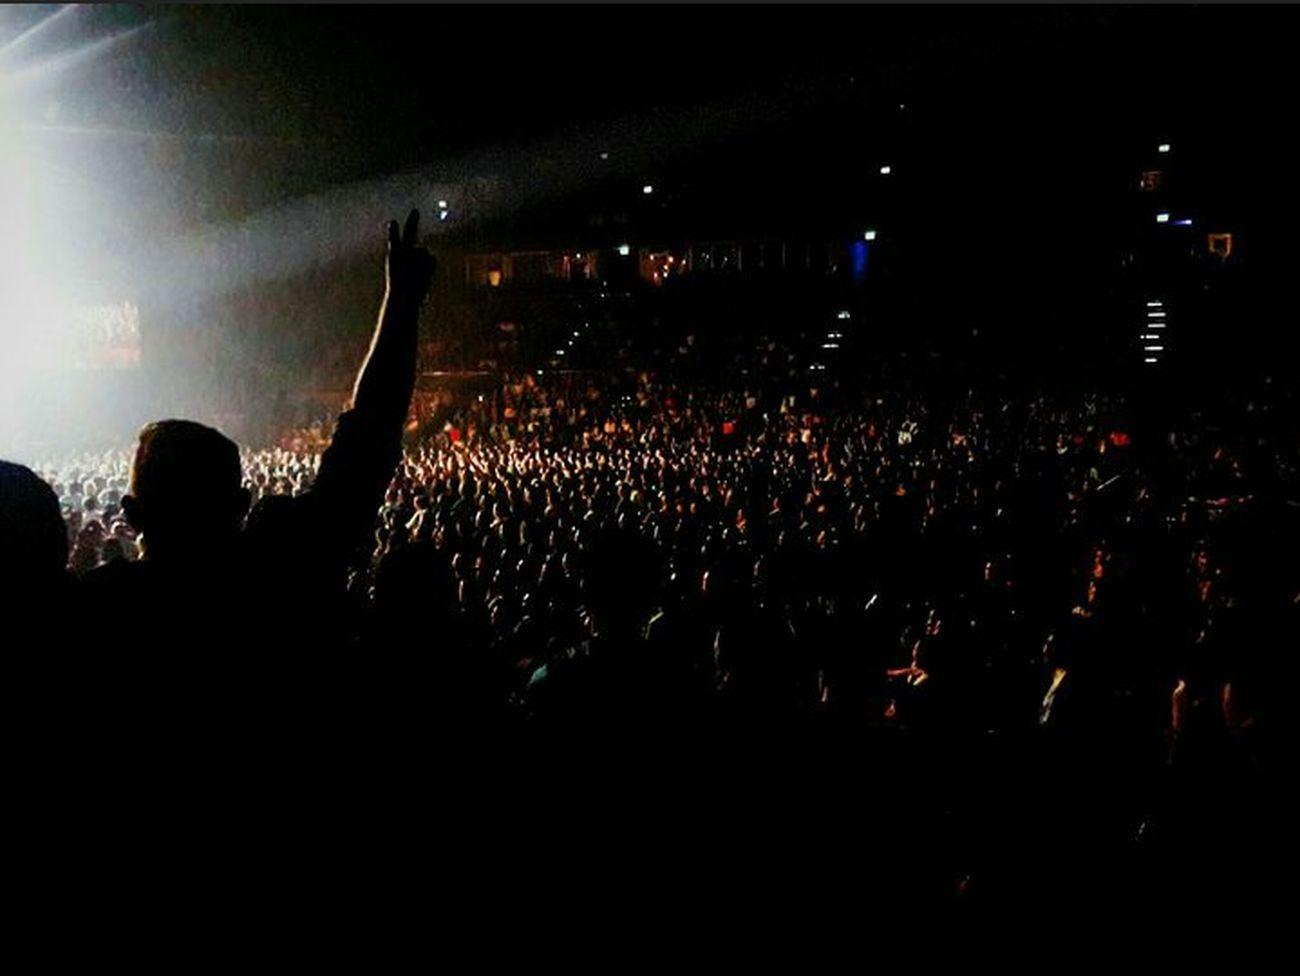 @pichayutpromburee ★★★★★★ Popular Photos Shoutoutvlog Bestphotographer EyeEmBestPics Photographer Photography EyeEm Best Shots Action Shot  Concert Nightlife